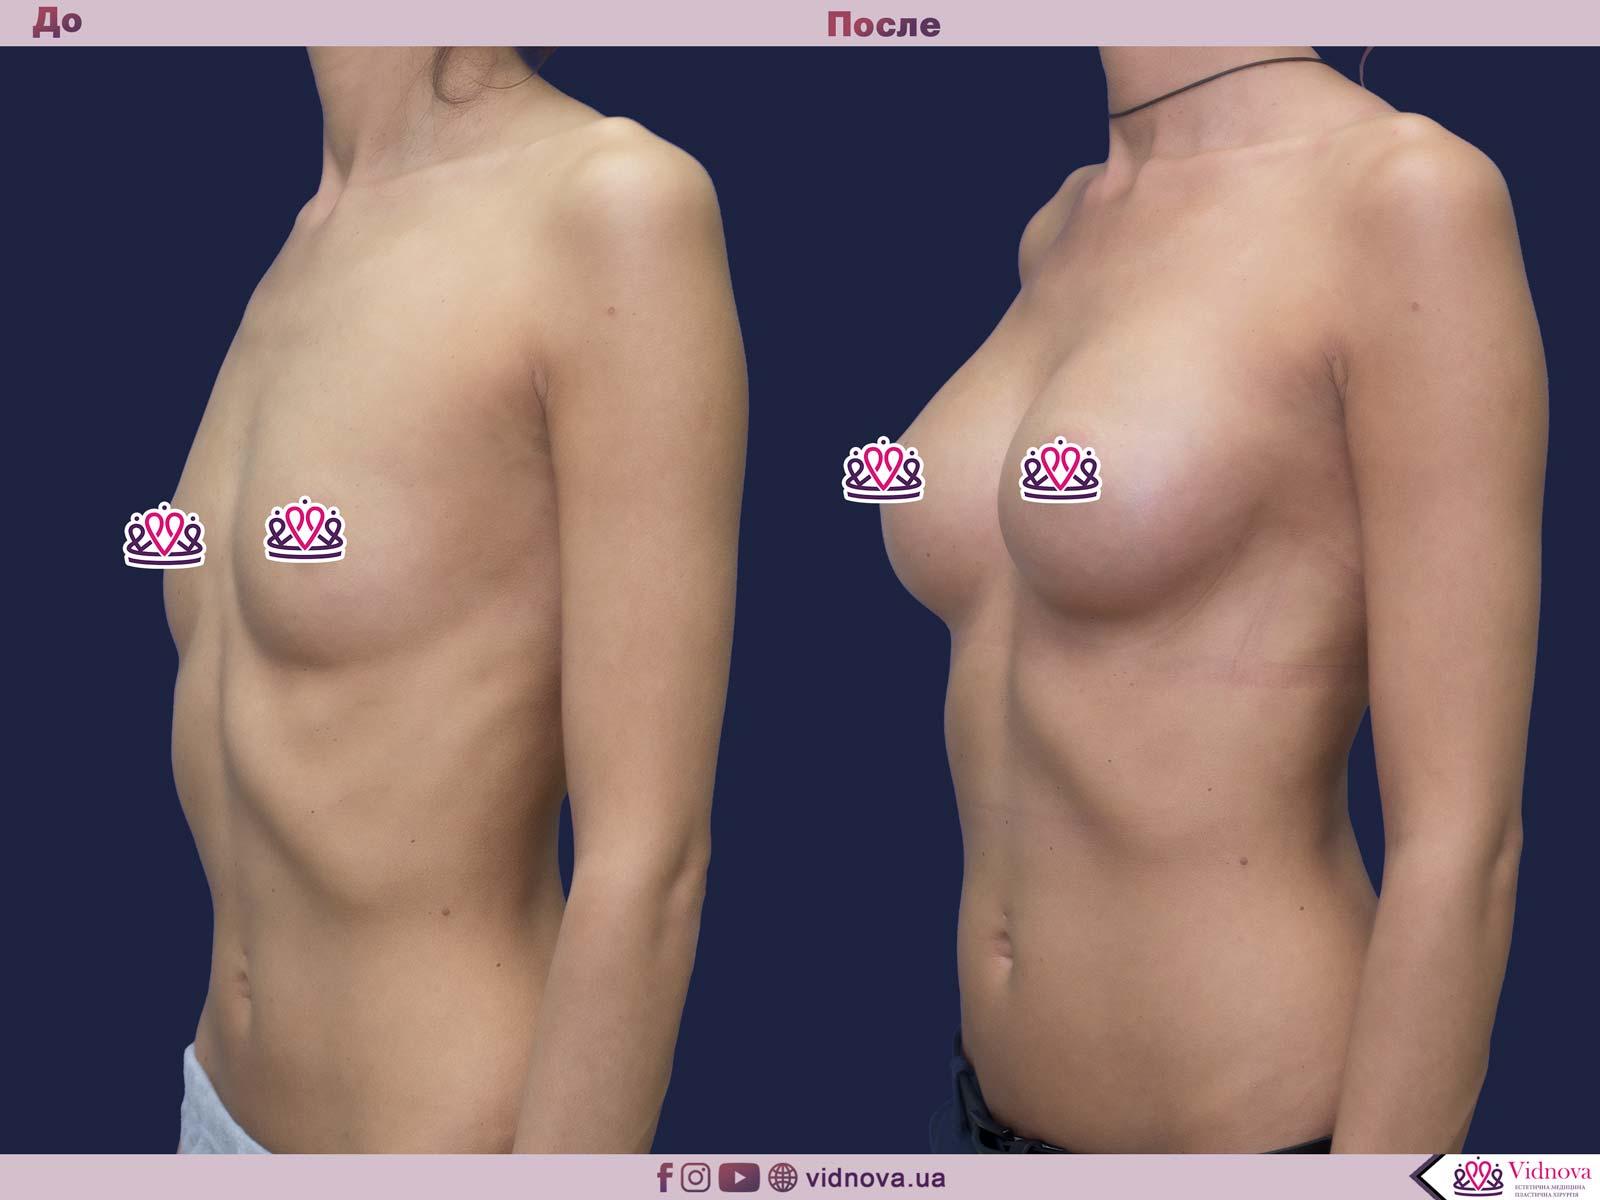 Увеличение груди: Фото ДО и ПОСЛЕ - Пример №60-2 - Клиника Vidnova